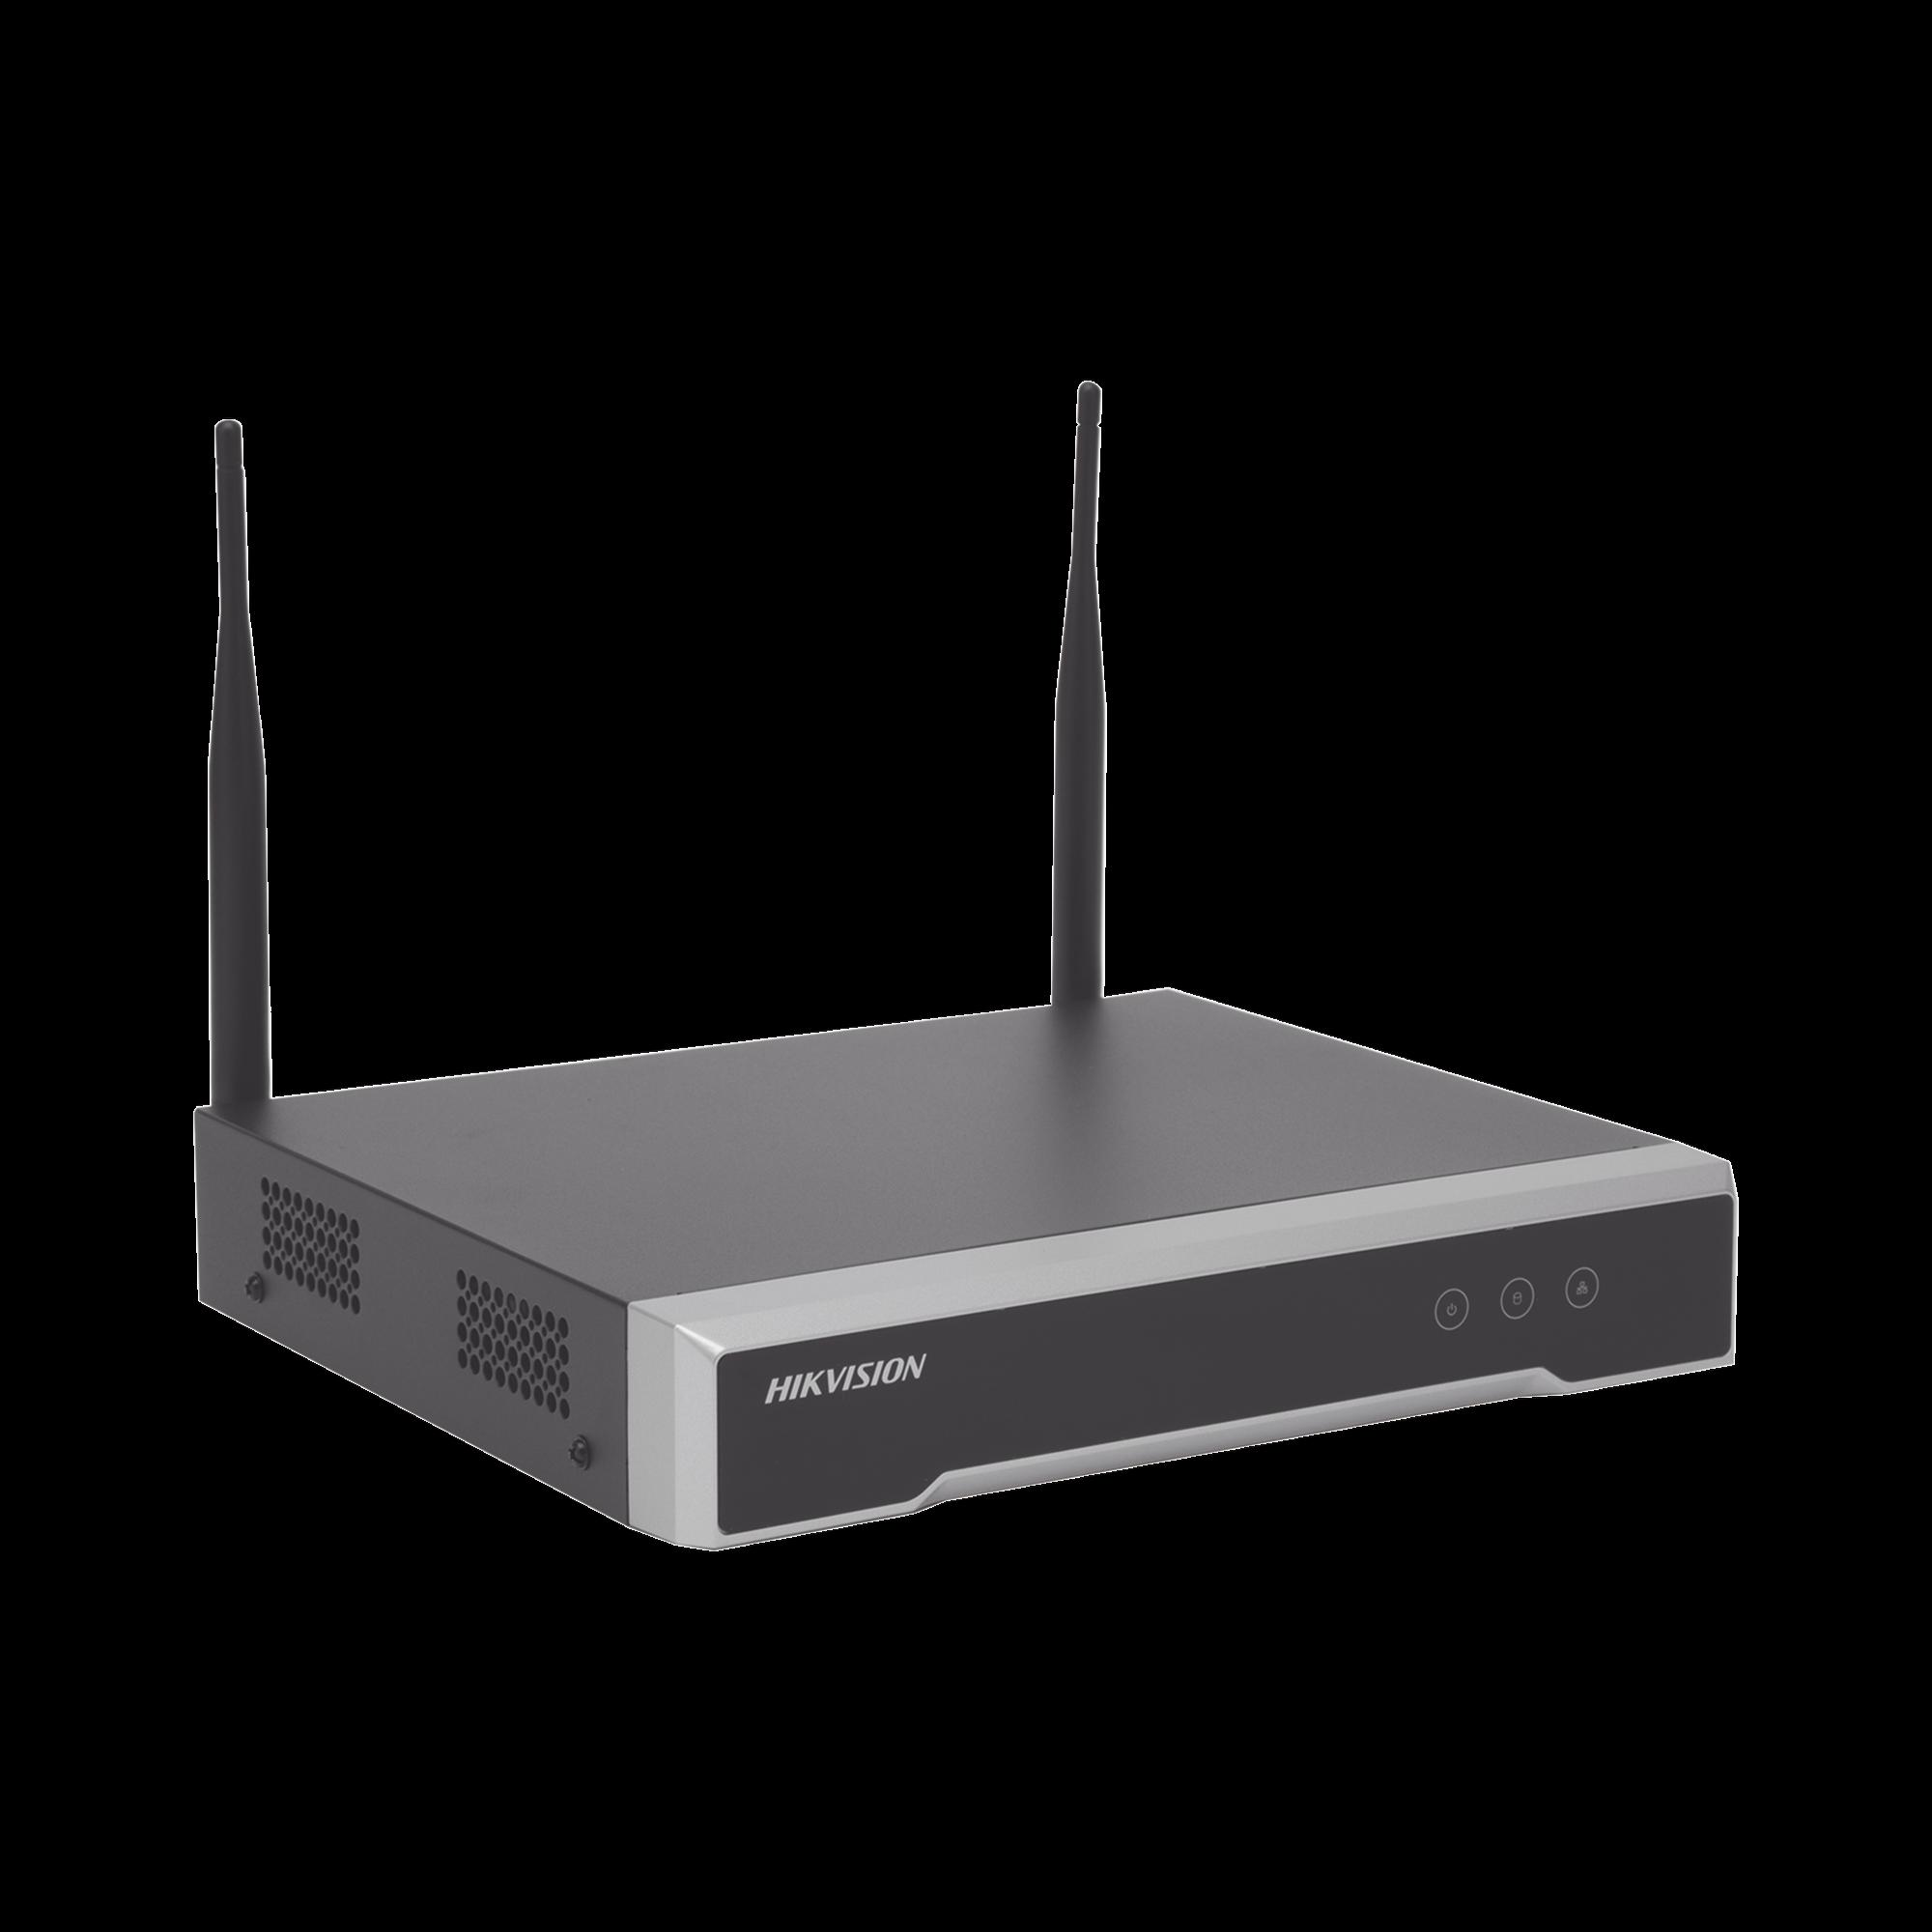 NVR 4 Megapixel / 4 canales IP / 1 Bahía de Disco Duro / 2 Antenas Wi-Fi / Salida de Vídeo Full HD